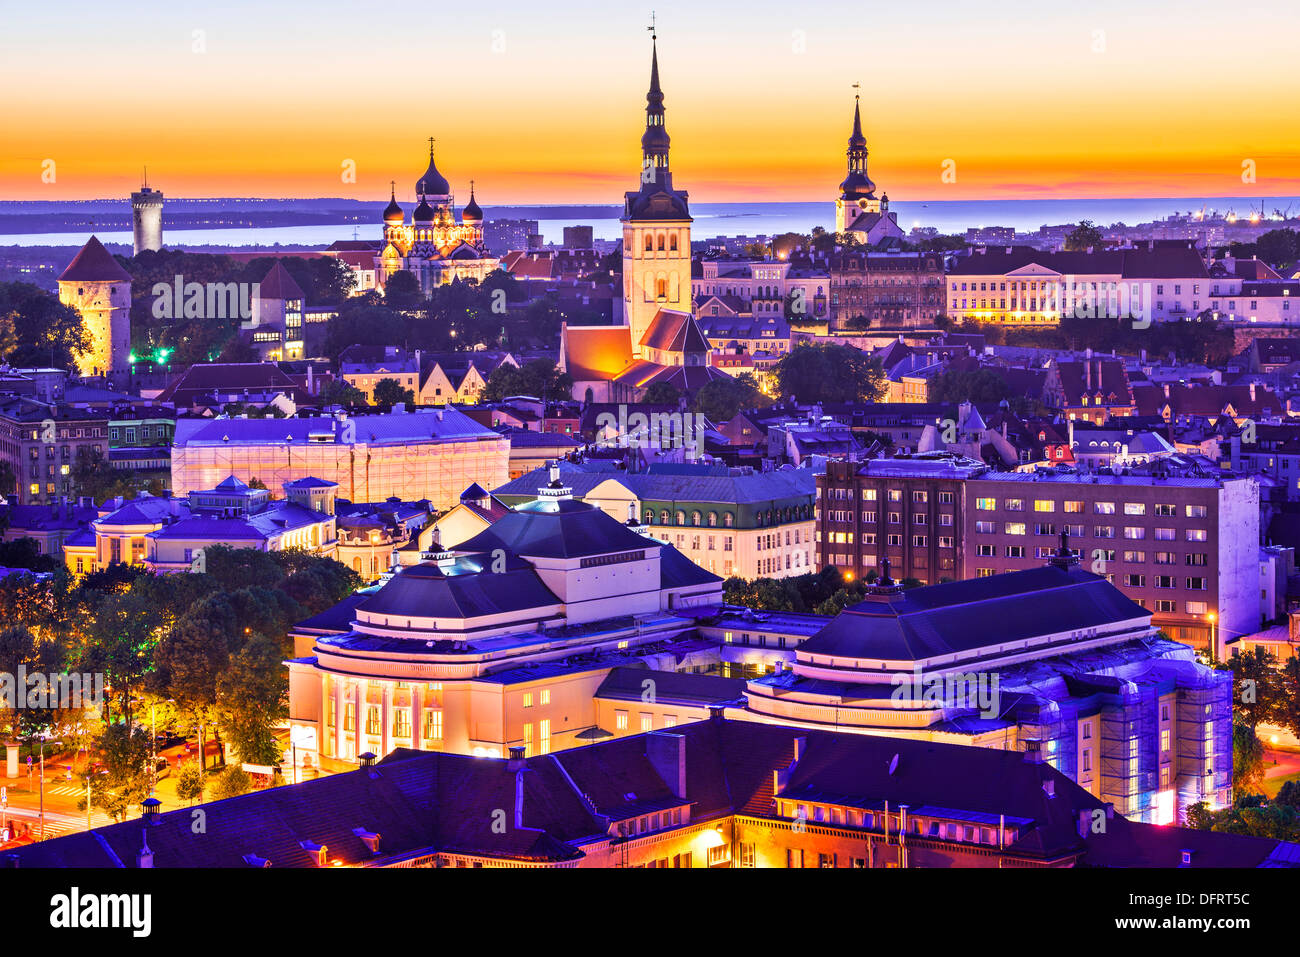 Skyline von Tallinn, Estland bei Sonnenuntergang. Stockbild